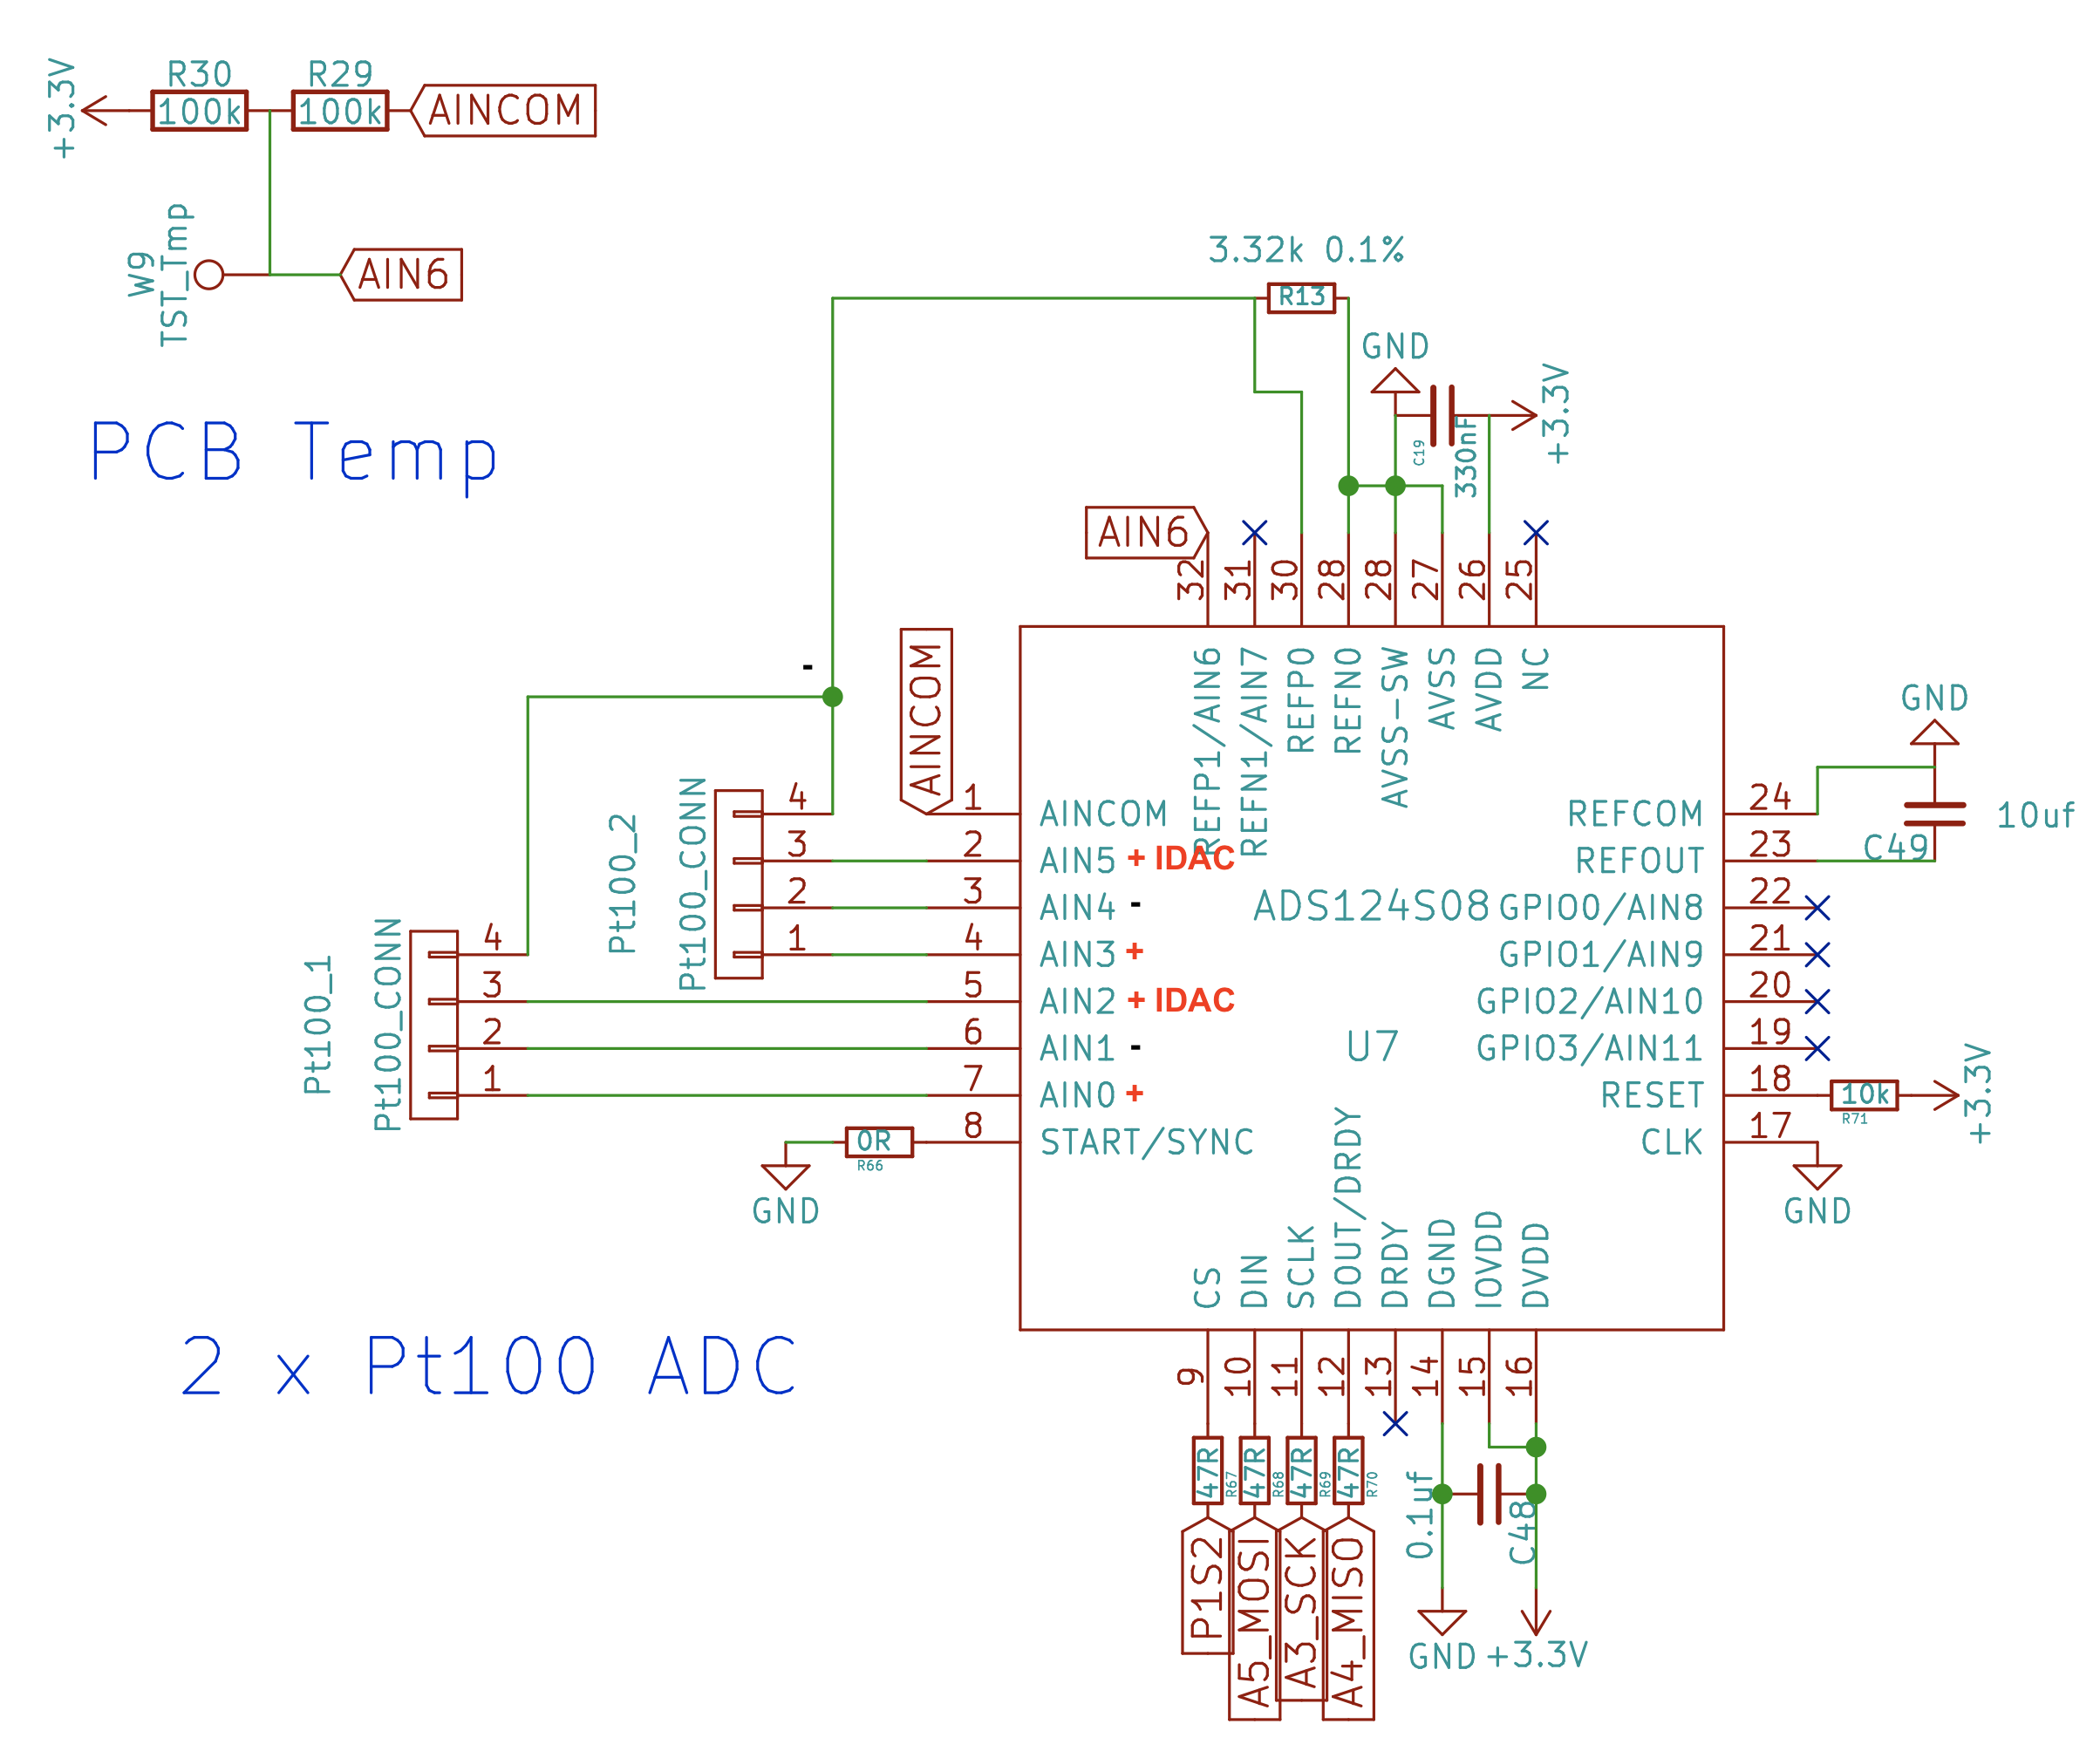 Fluke 744 3 Wire Rtd Diagram